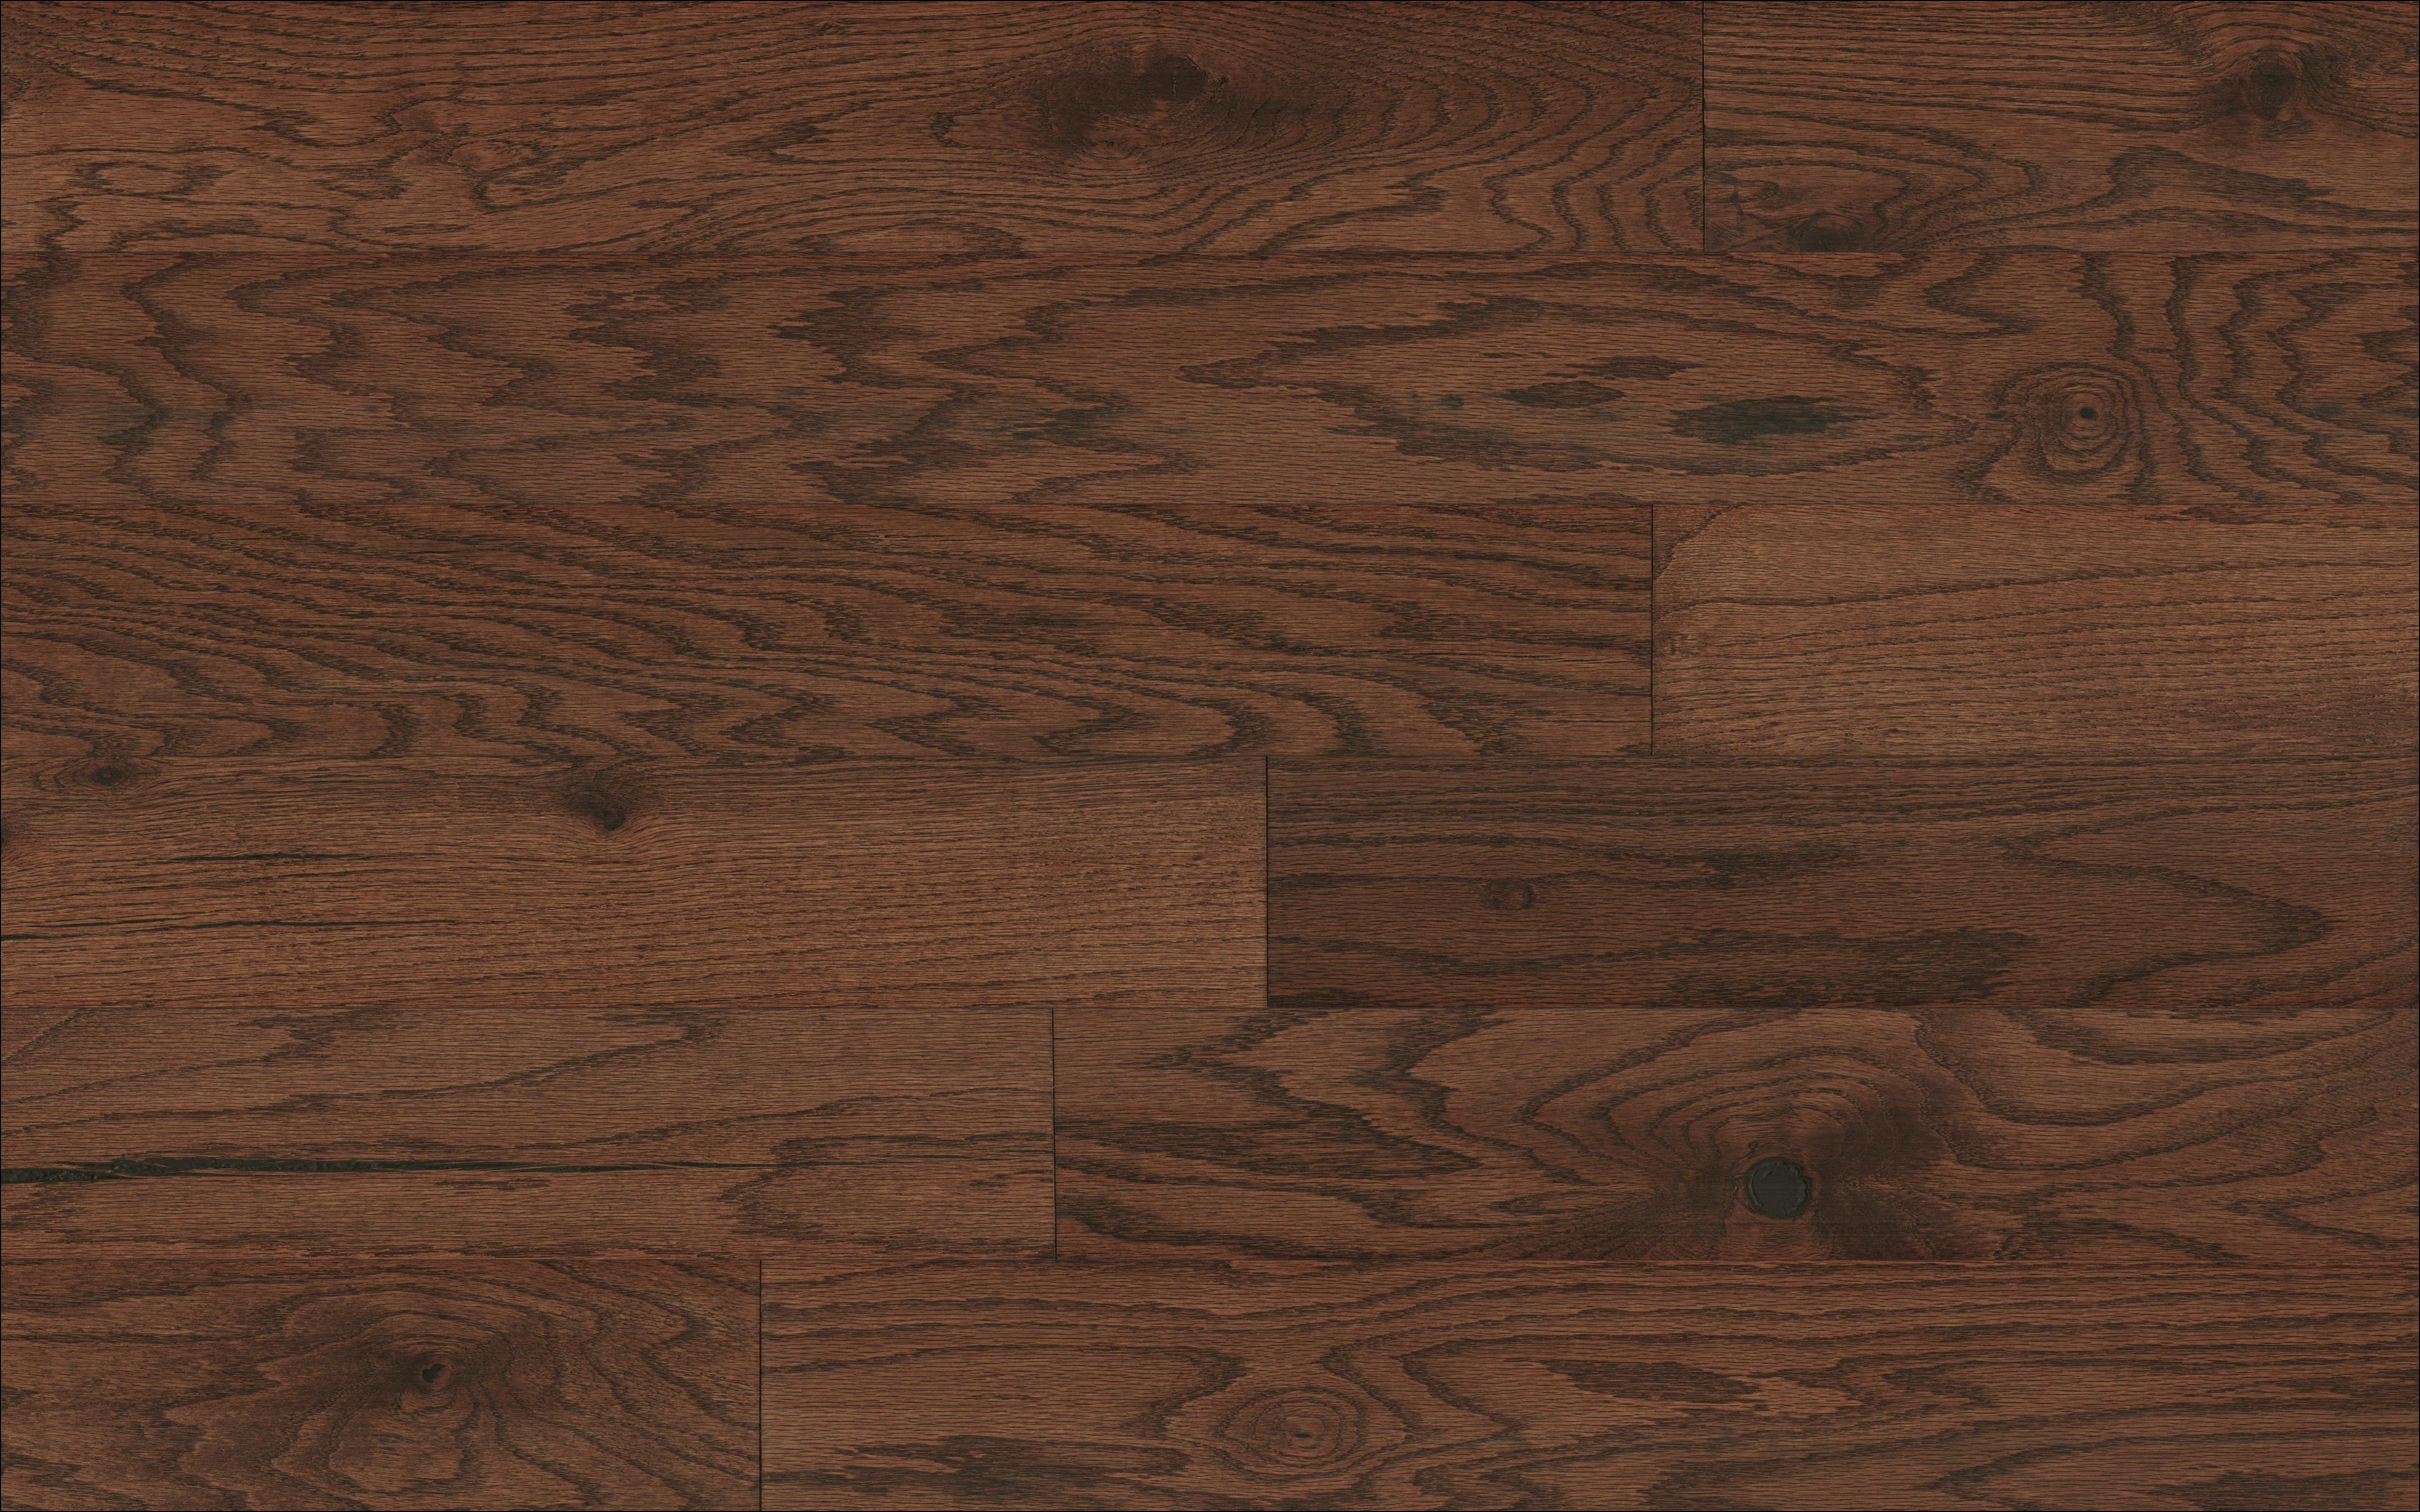 hardwood flooring prices of best place flooring ideas in best place to buy engineered hardwood flooring collection mullican devonshire oak saddle 5 engineered hardwood